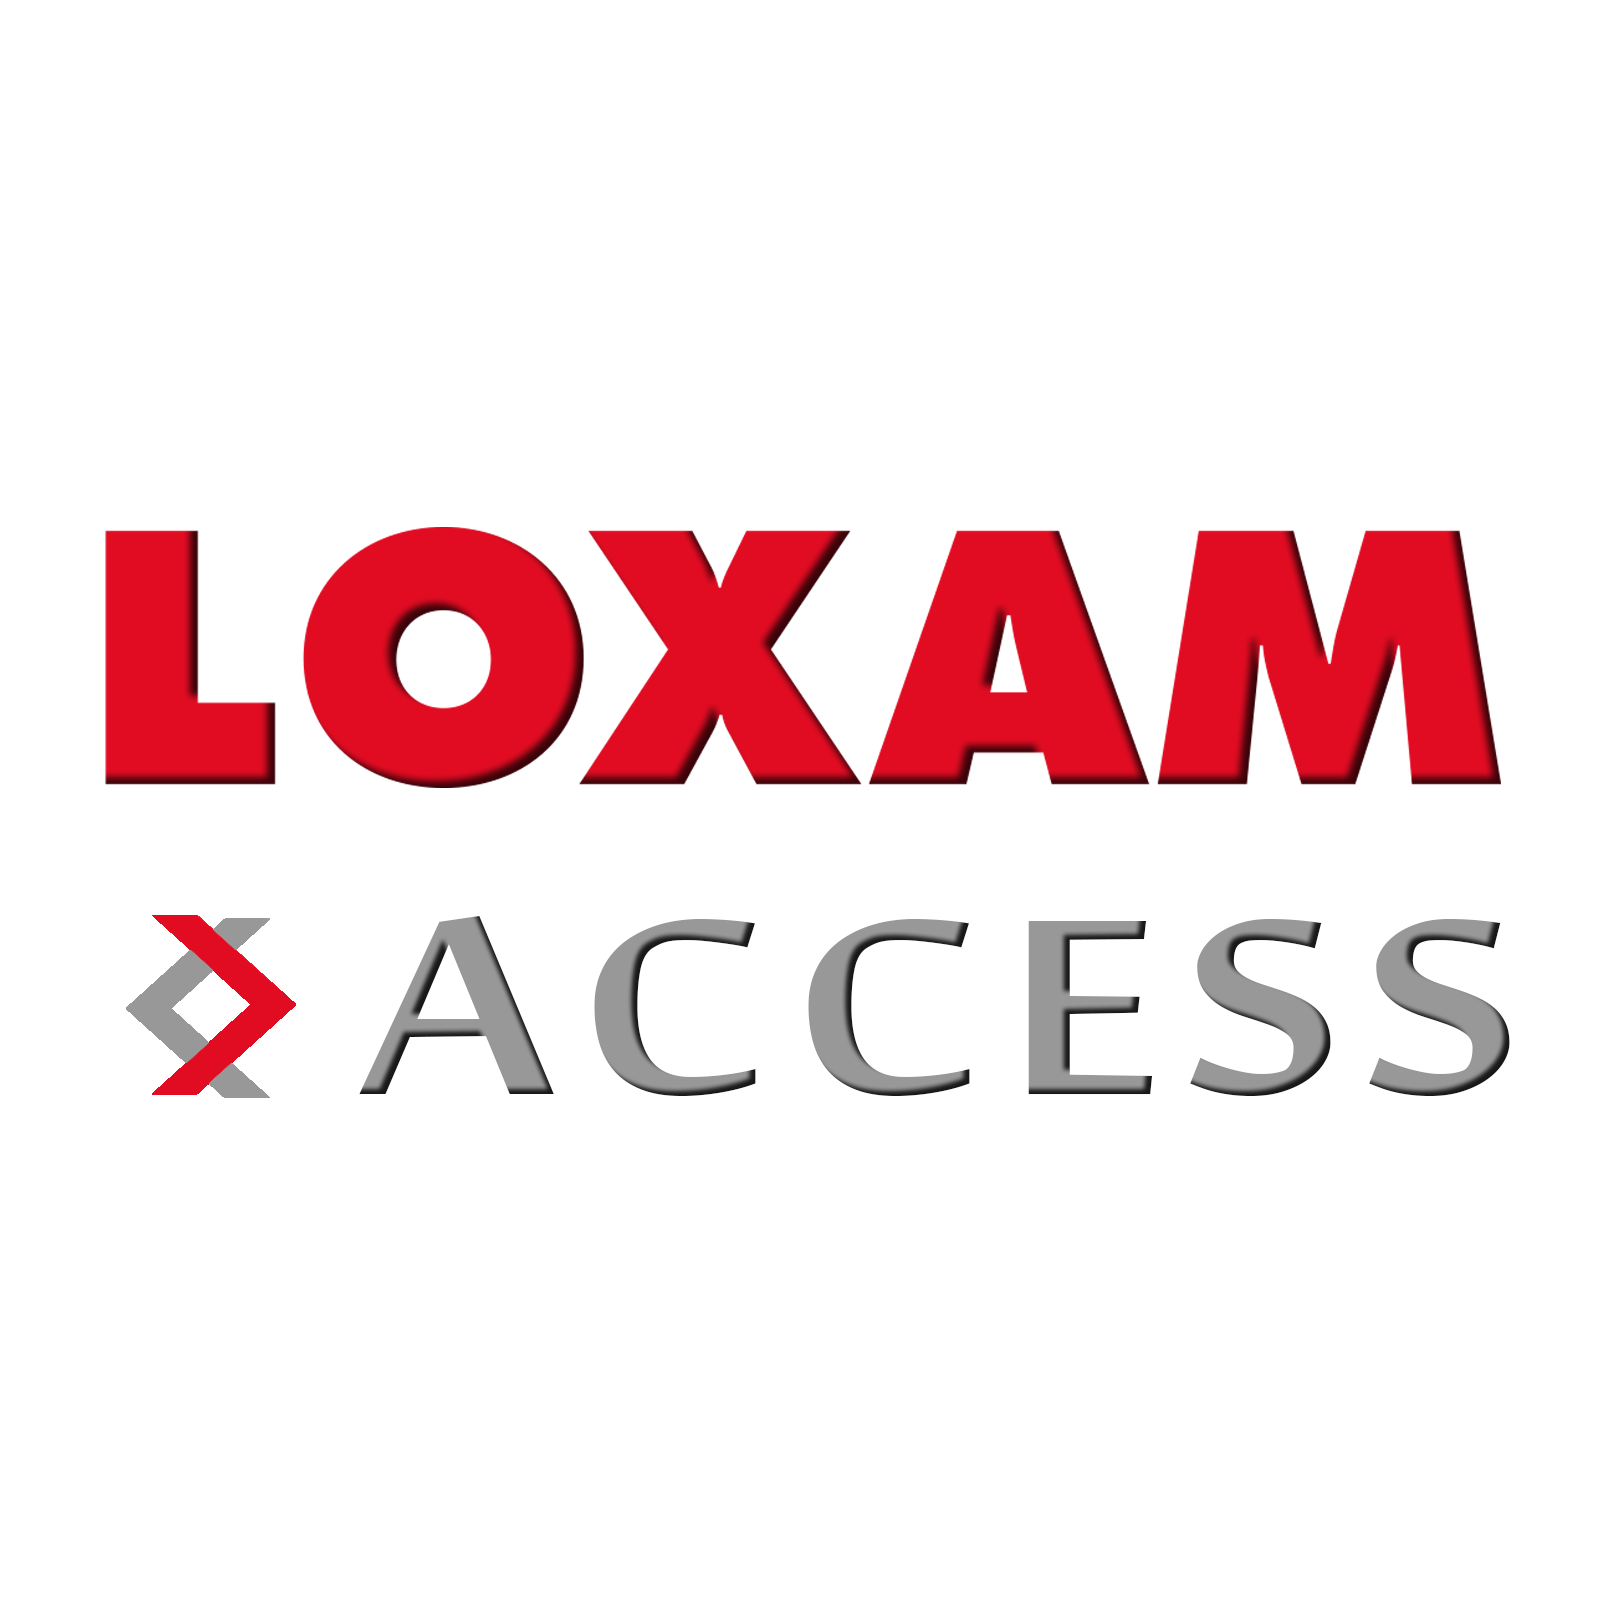 LOXAM Access